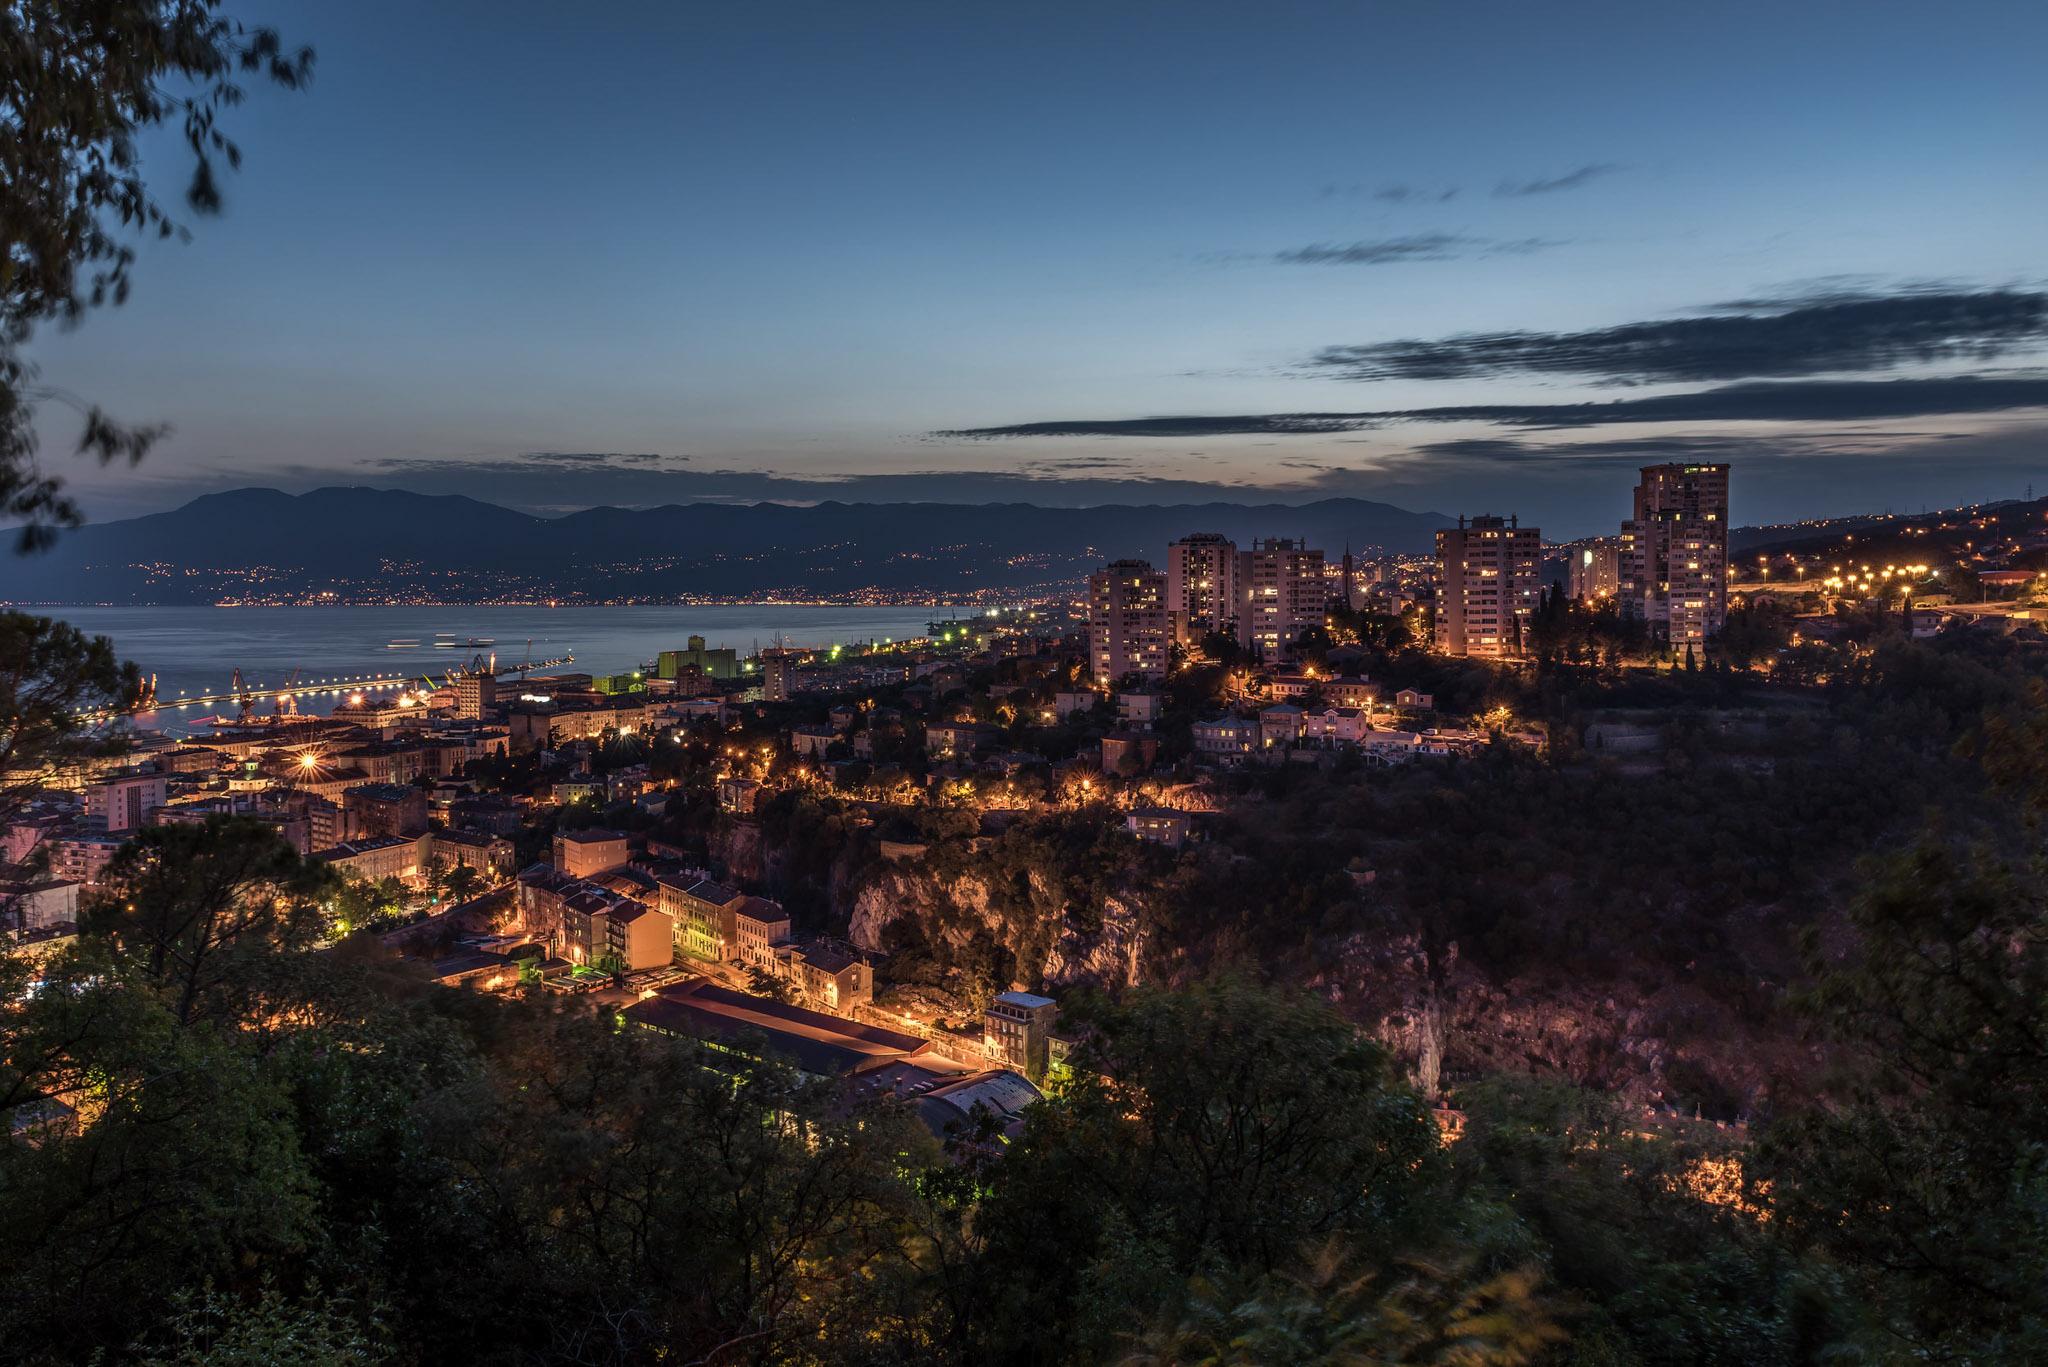 Rijeka bei Nacht (Foto: Niklas Neubauer)